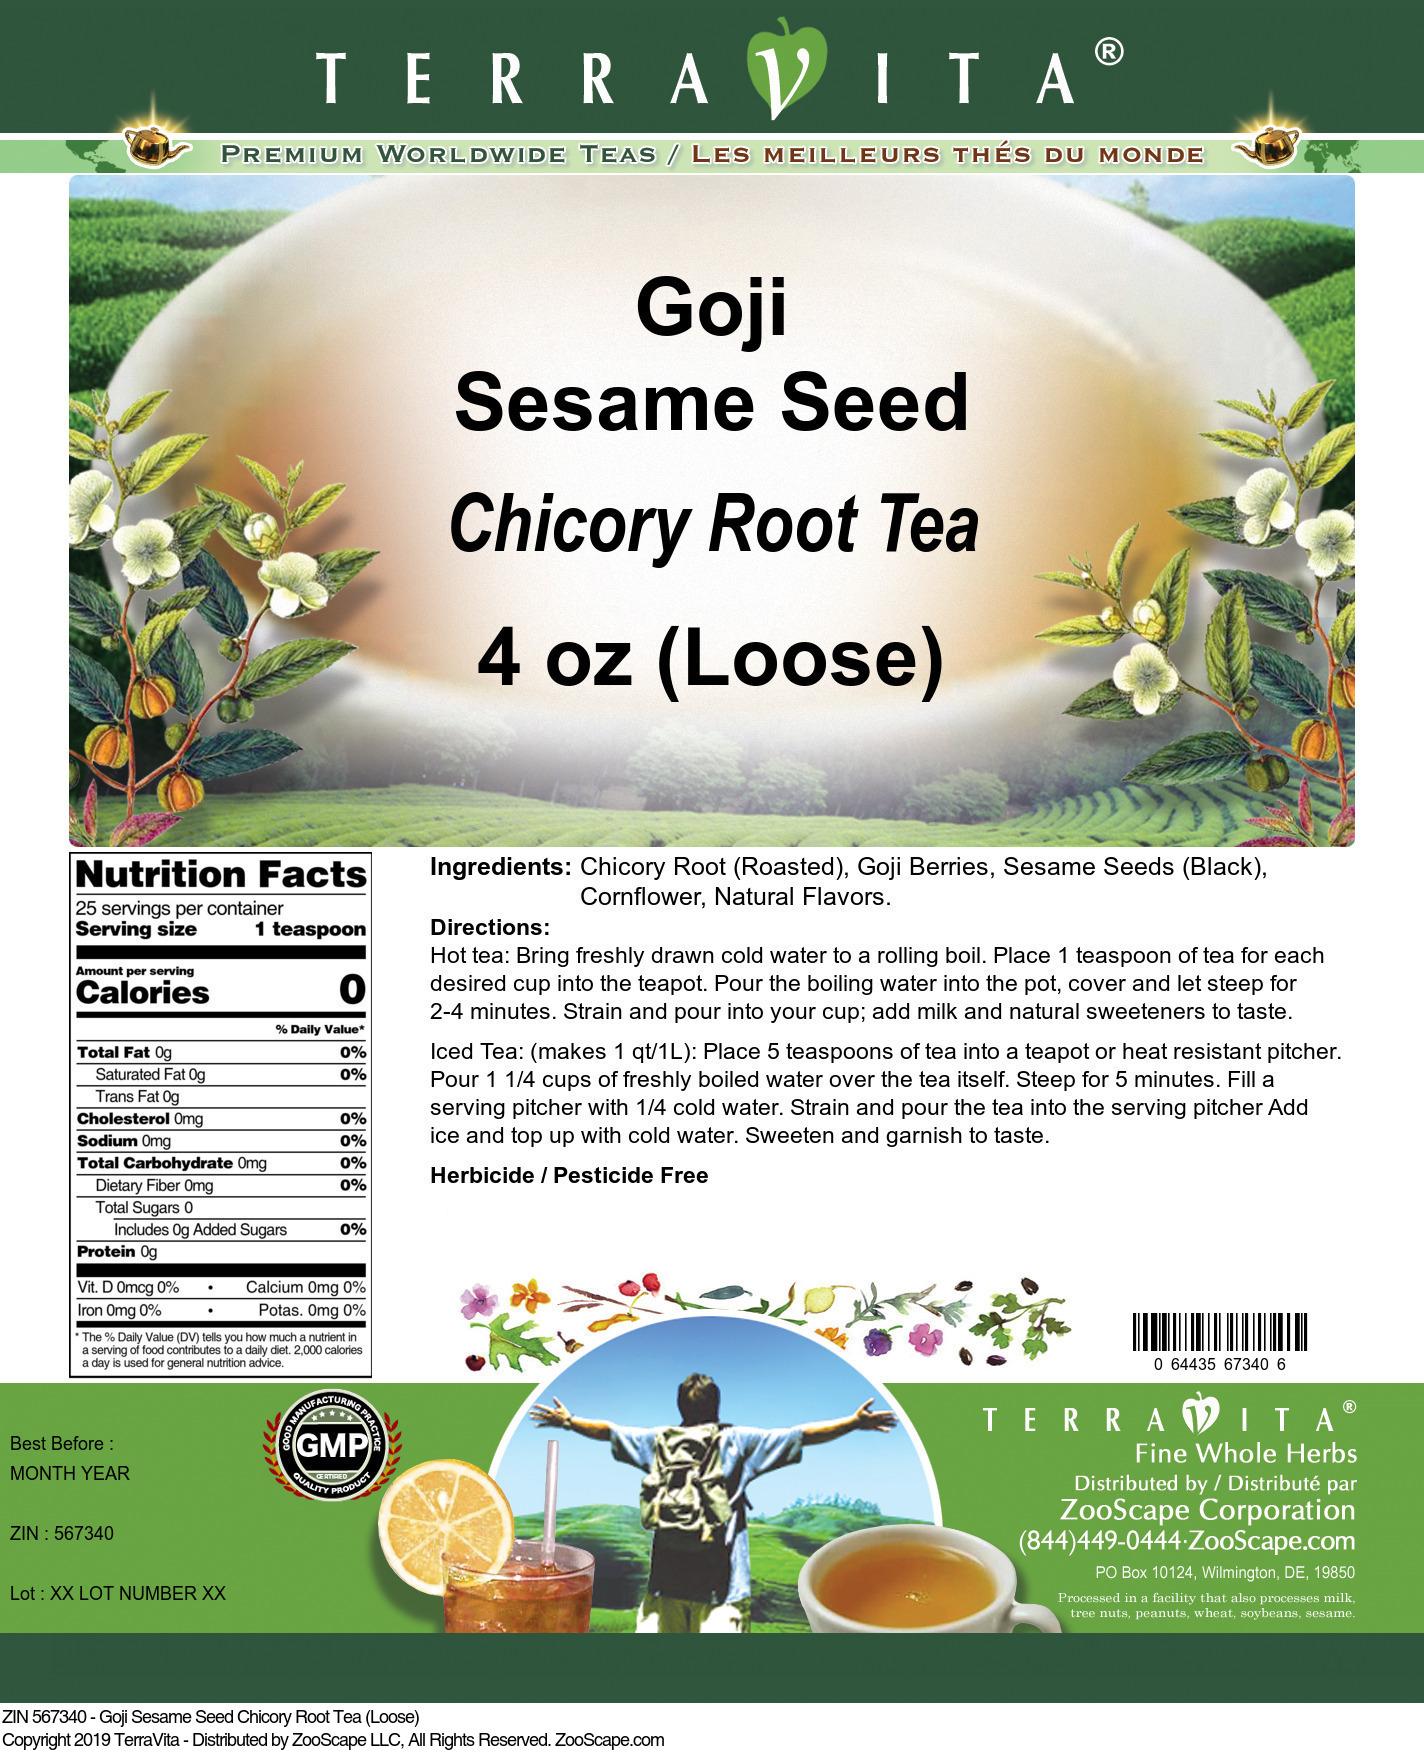 Goji Sesame Seed Chicory Root